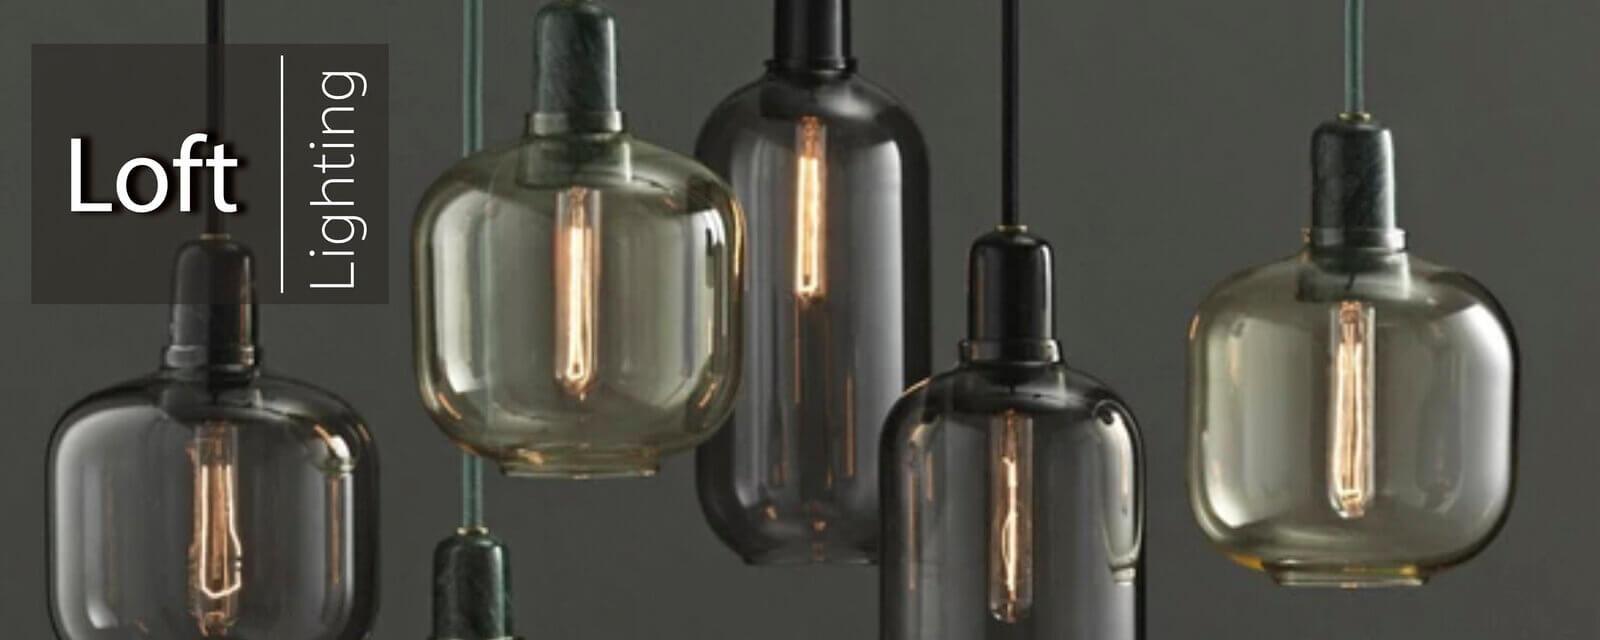 Loft Style | Lighting